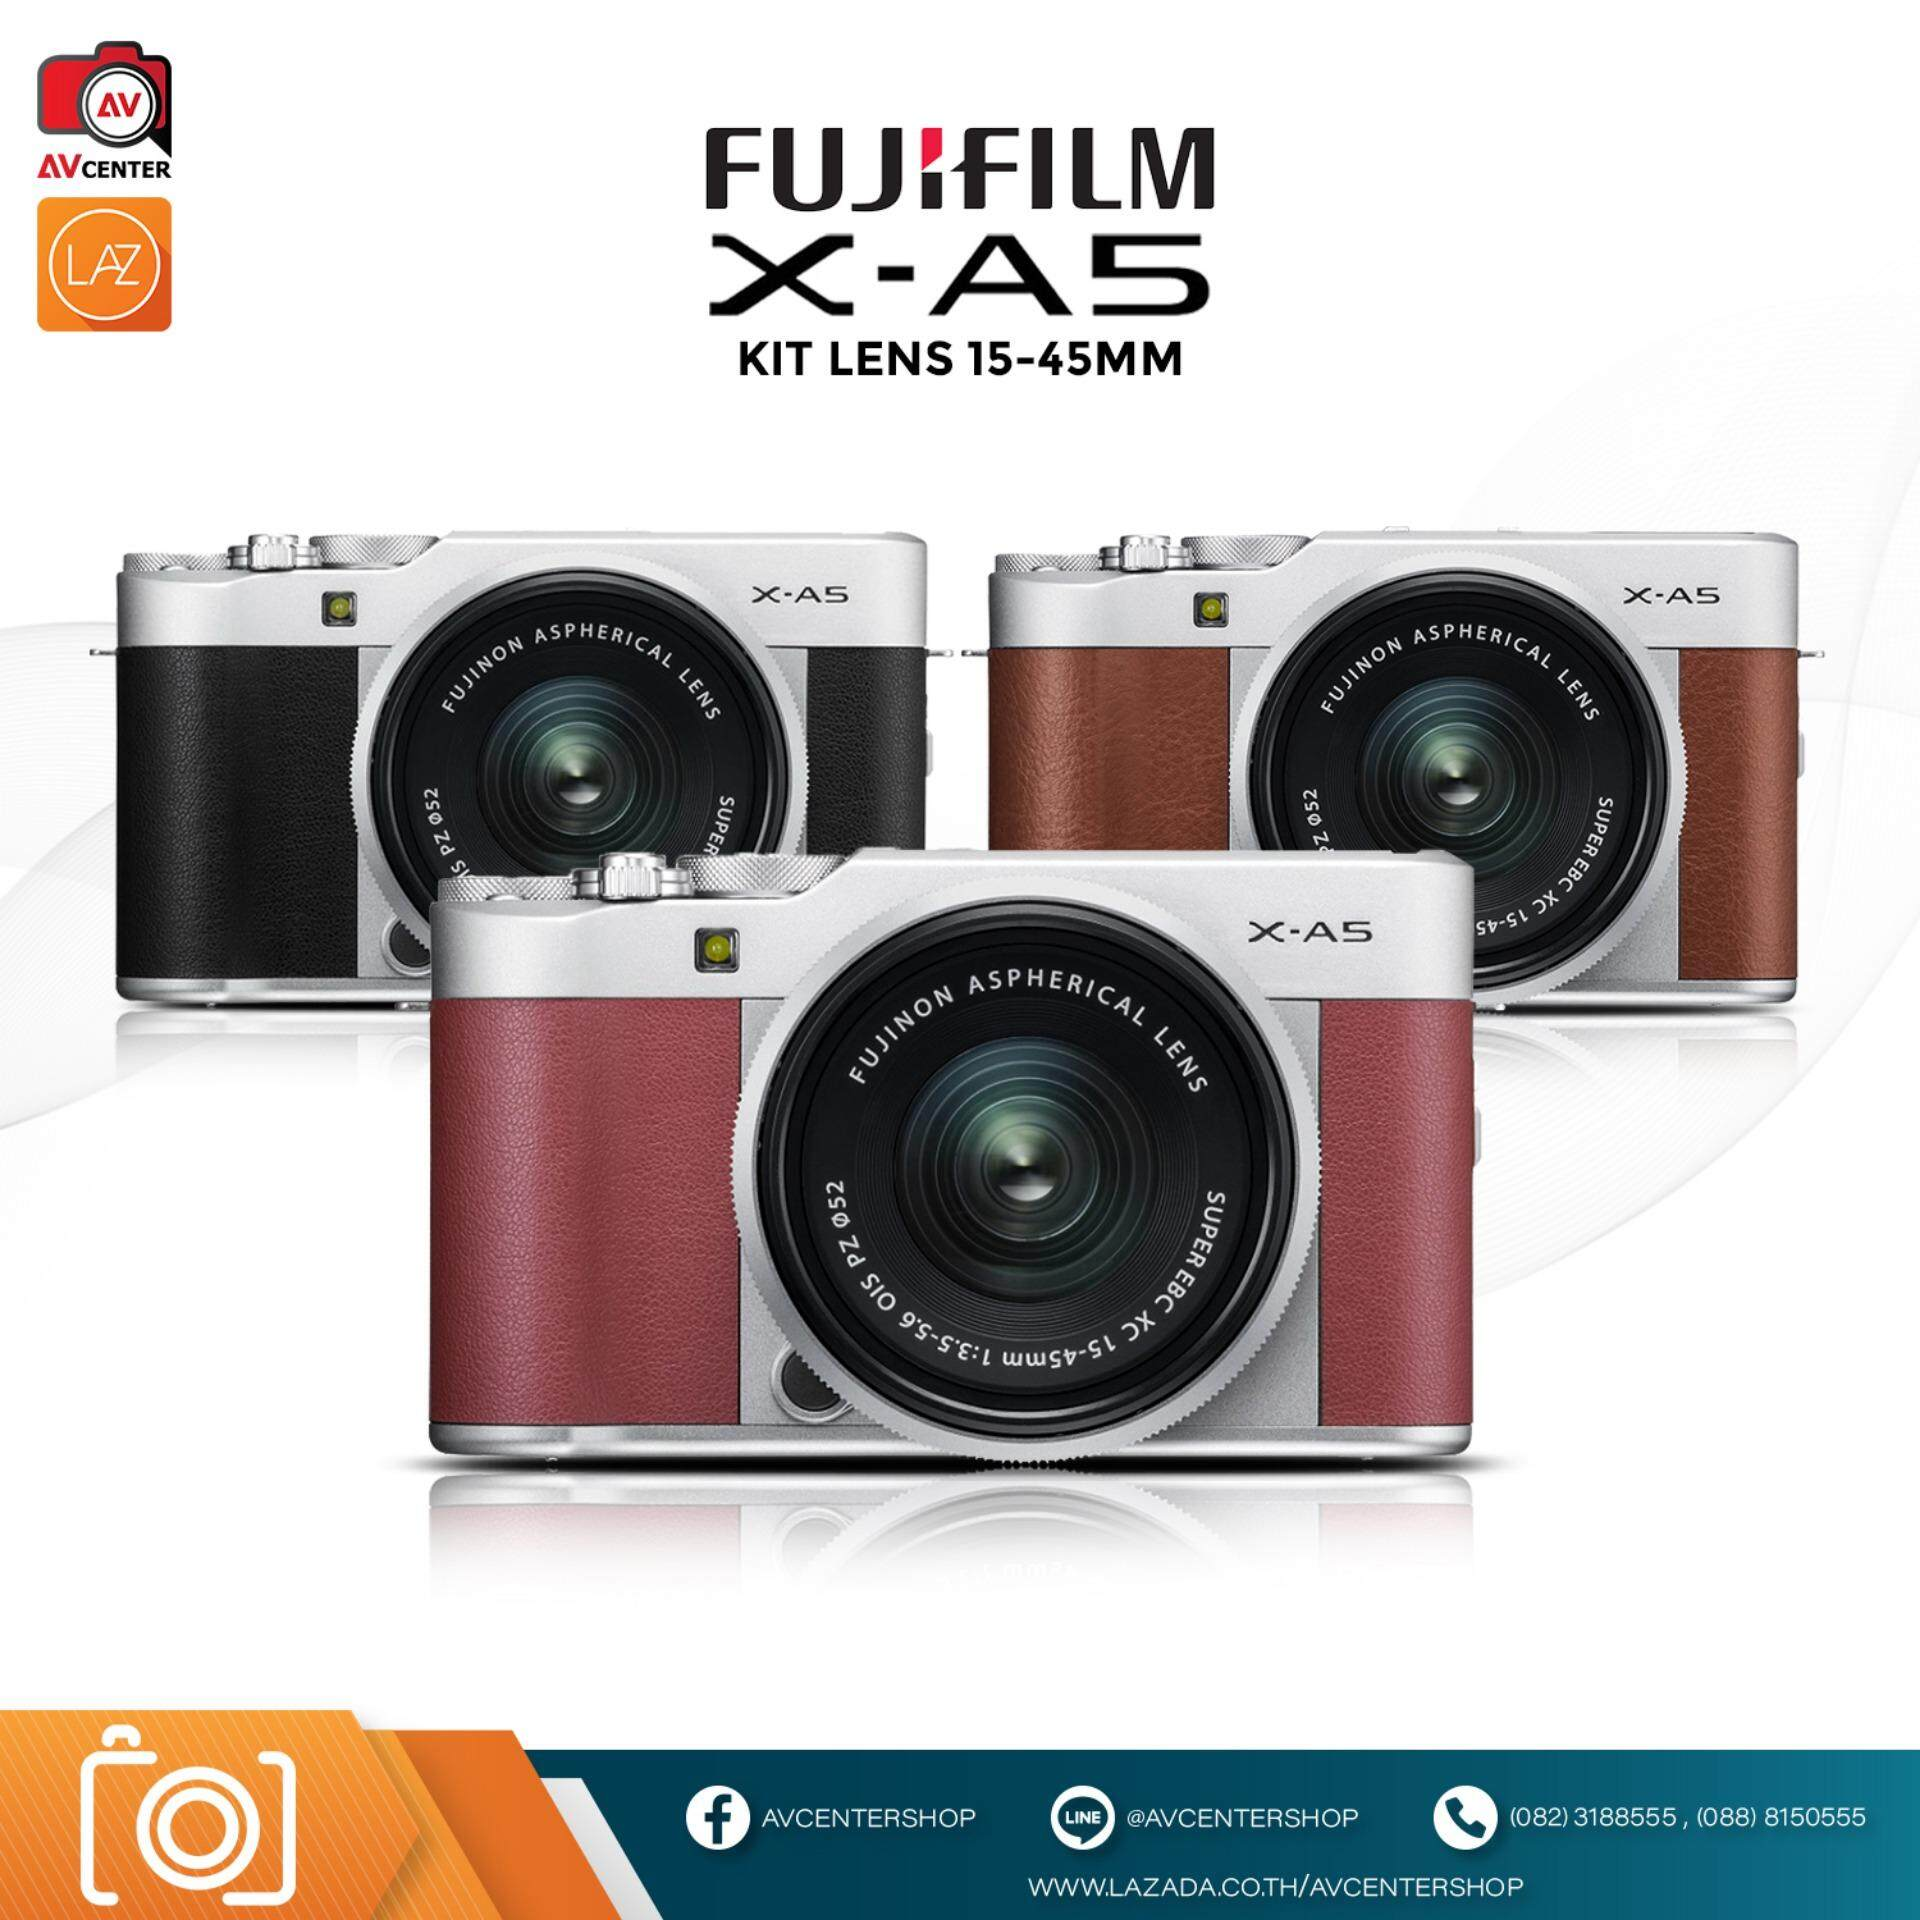 Fujifilm X-A5 Kit 15-45mm Ois Pz By Avcentershop.